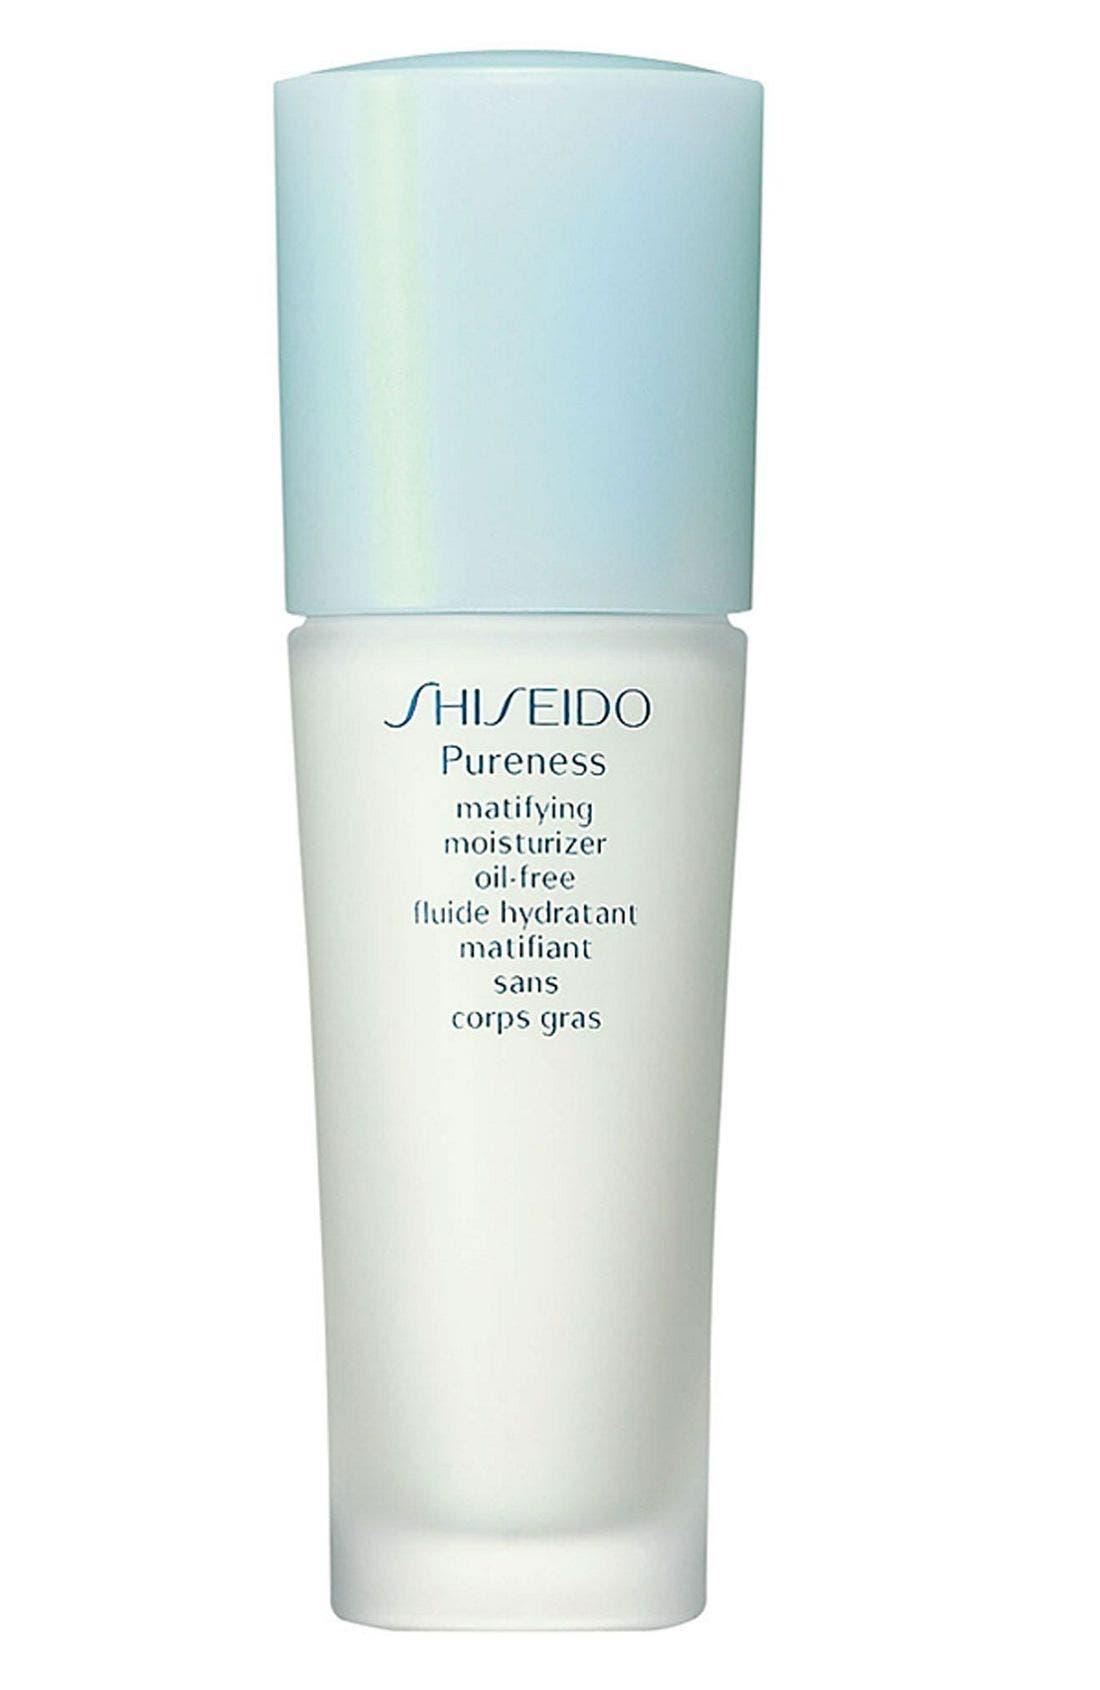 Shiseido 'Pureness' Oil-Free Matifying Moisturizer